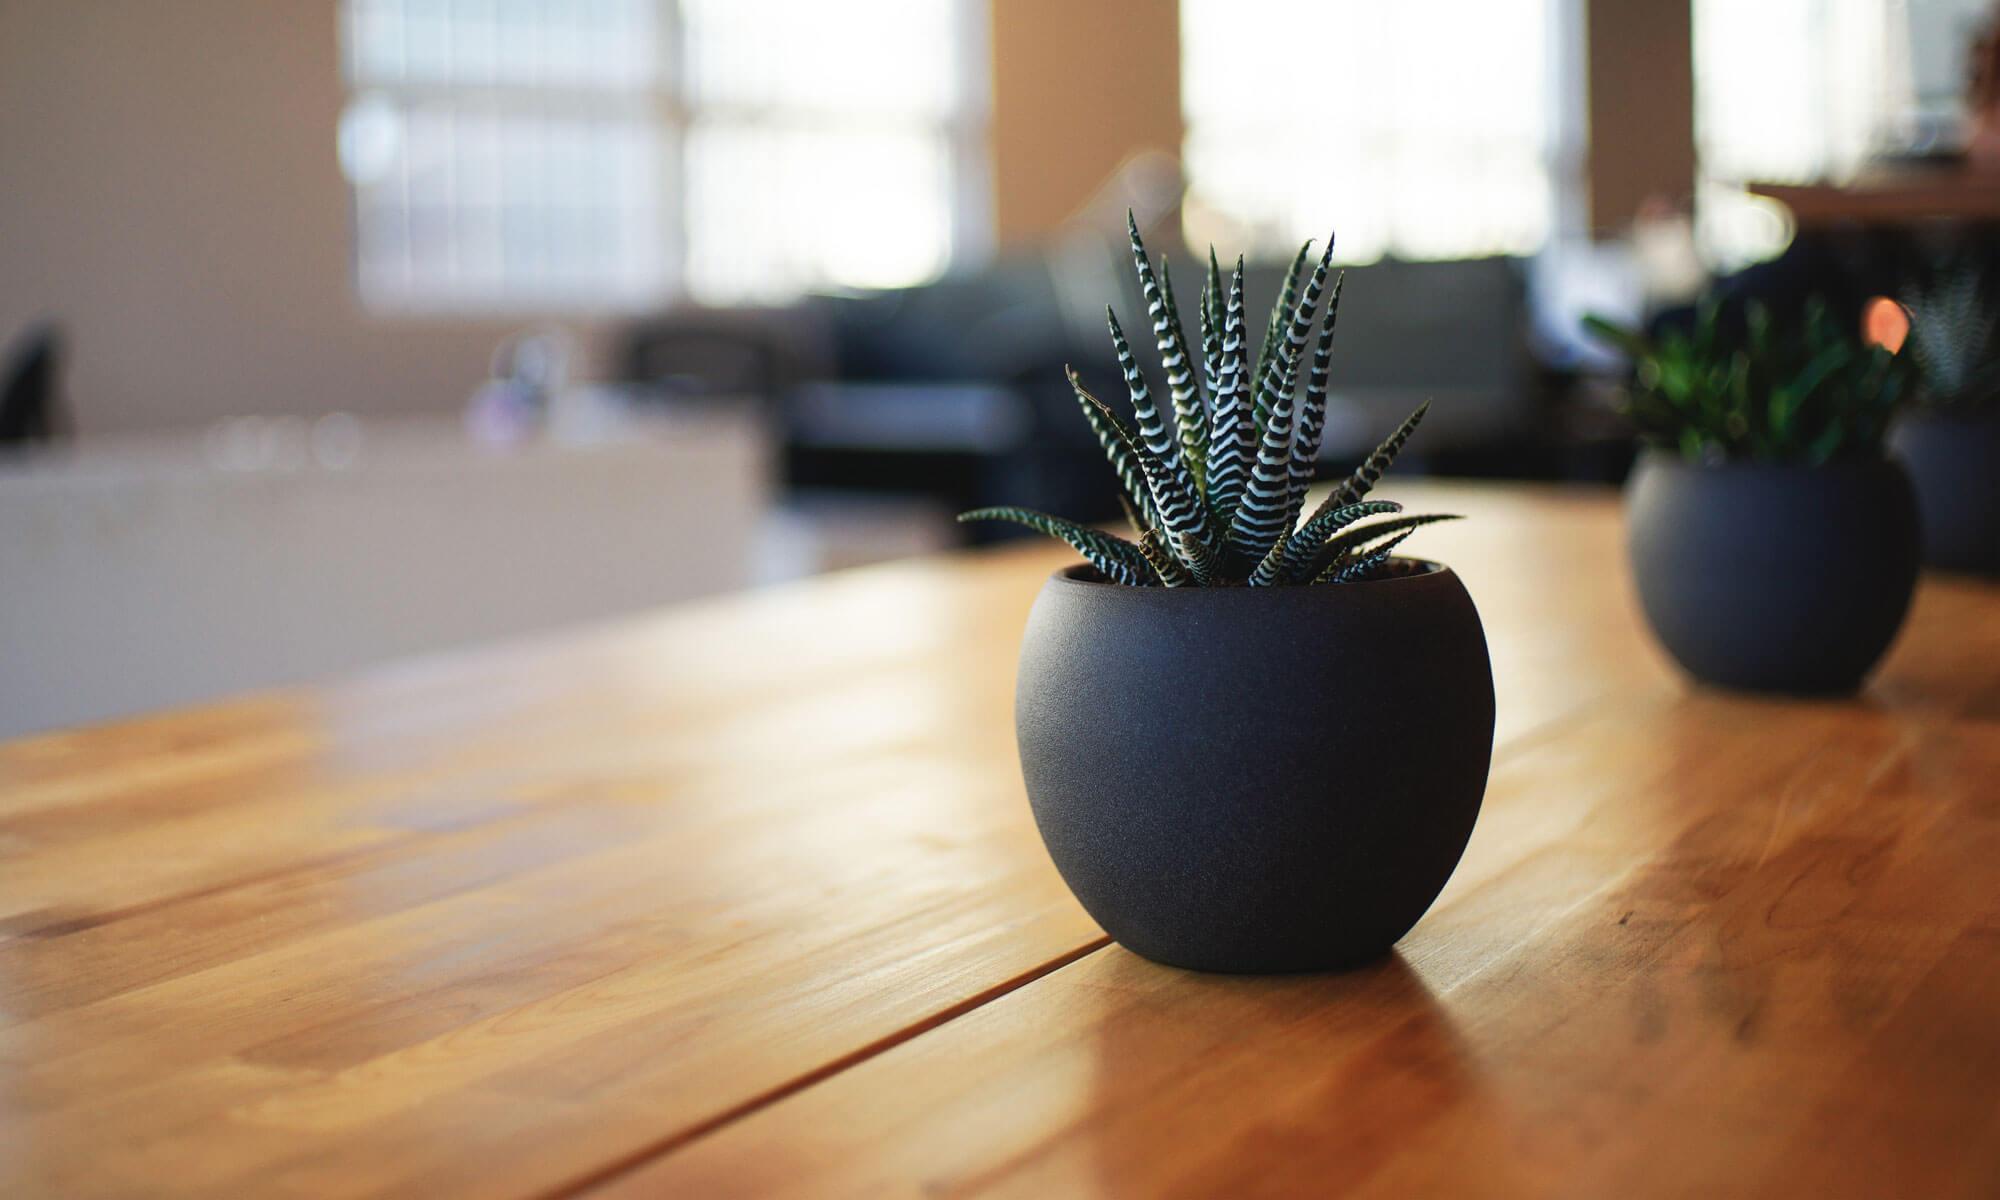 Melbourne Removals - Roofing - Corporate Gift Basket Ideas - Web Optimisation